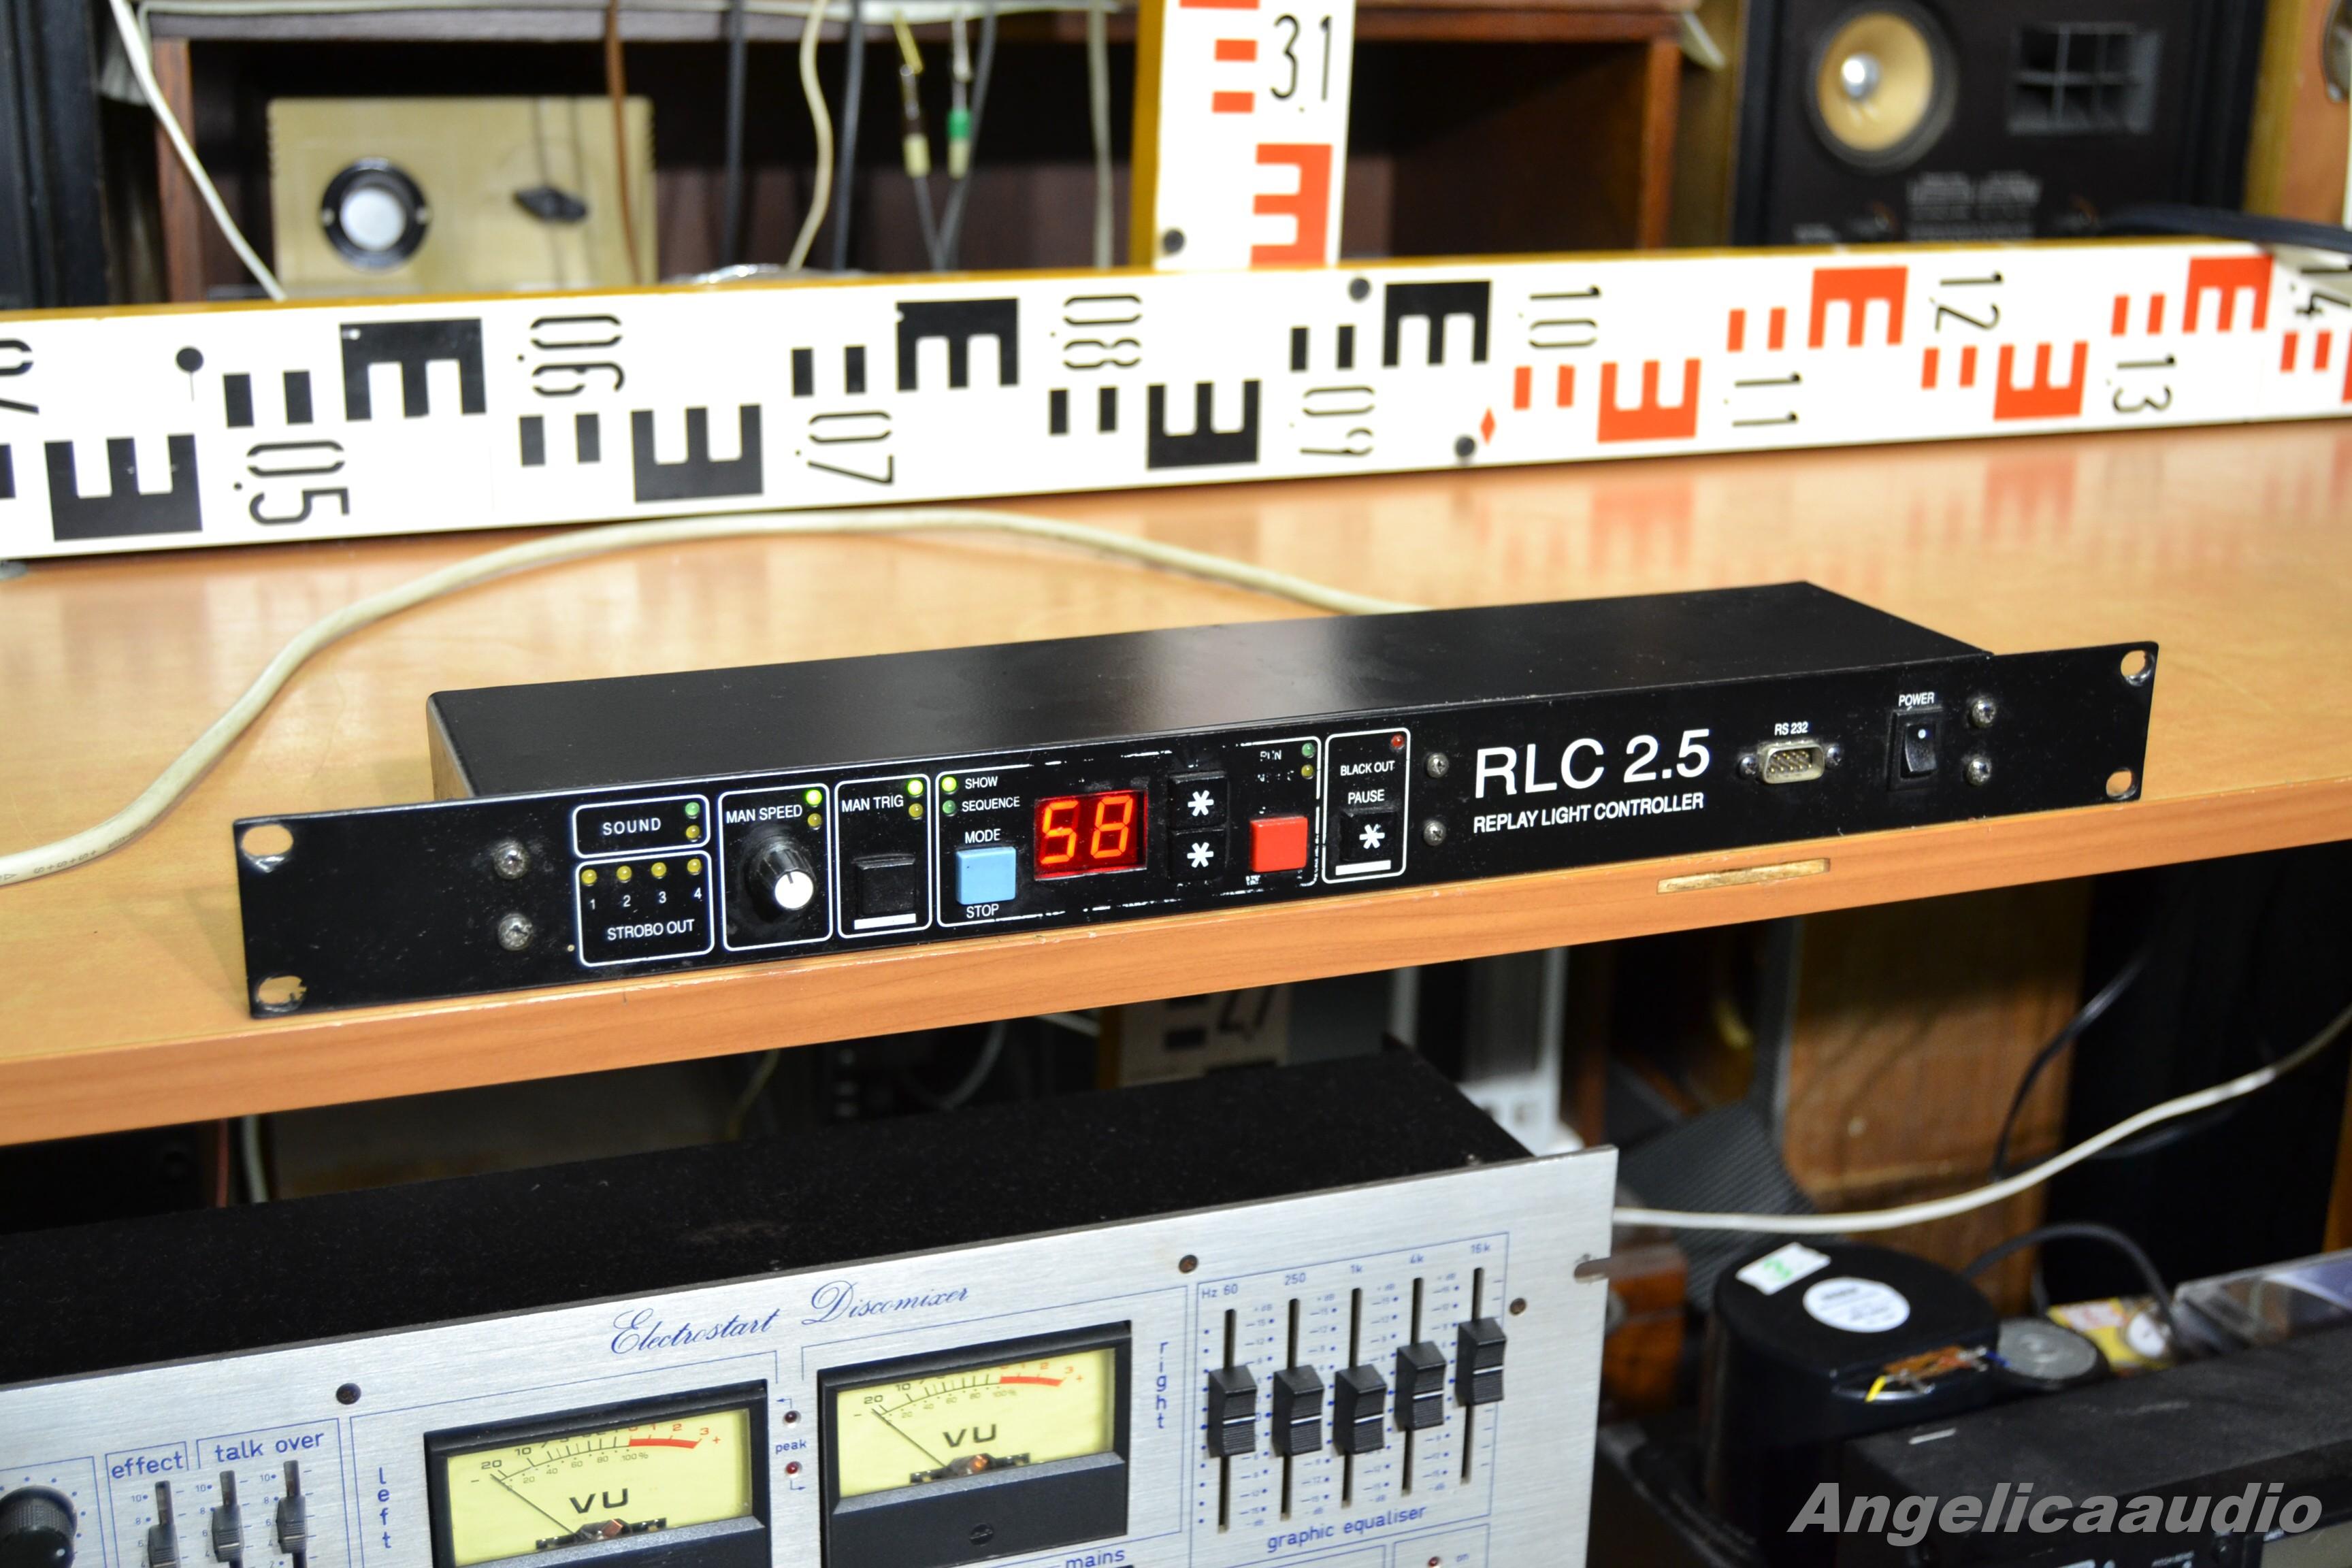 Rlc 2 5 Replay Light Controller Angelicaaudio 1990